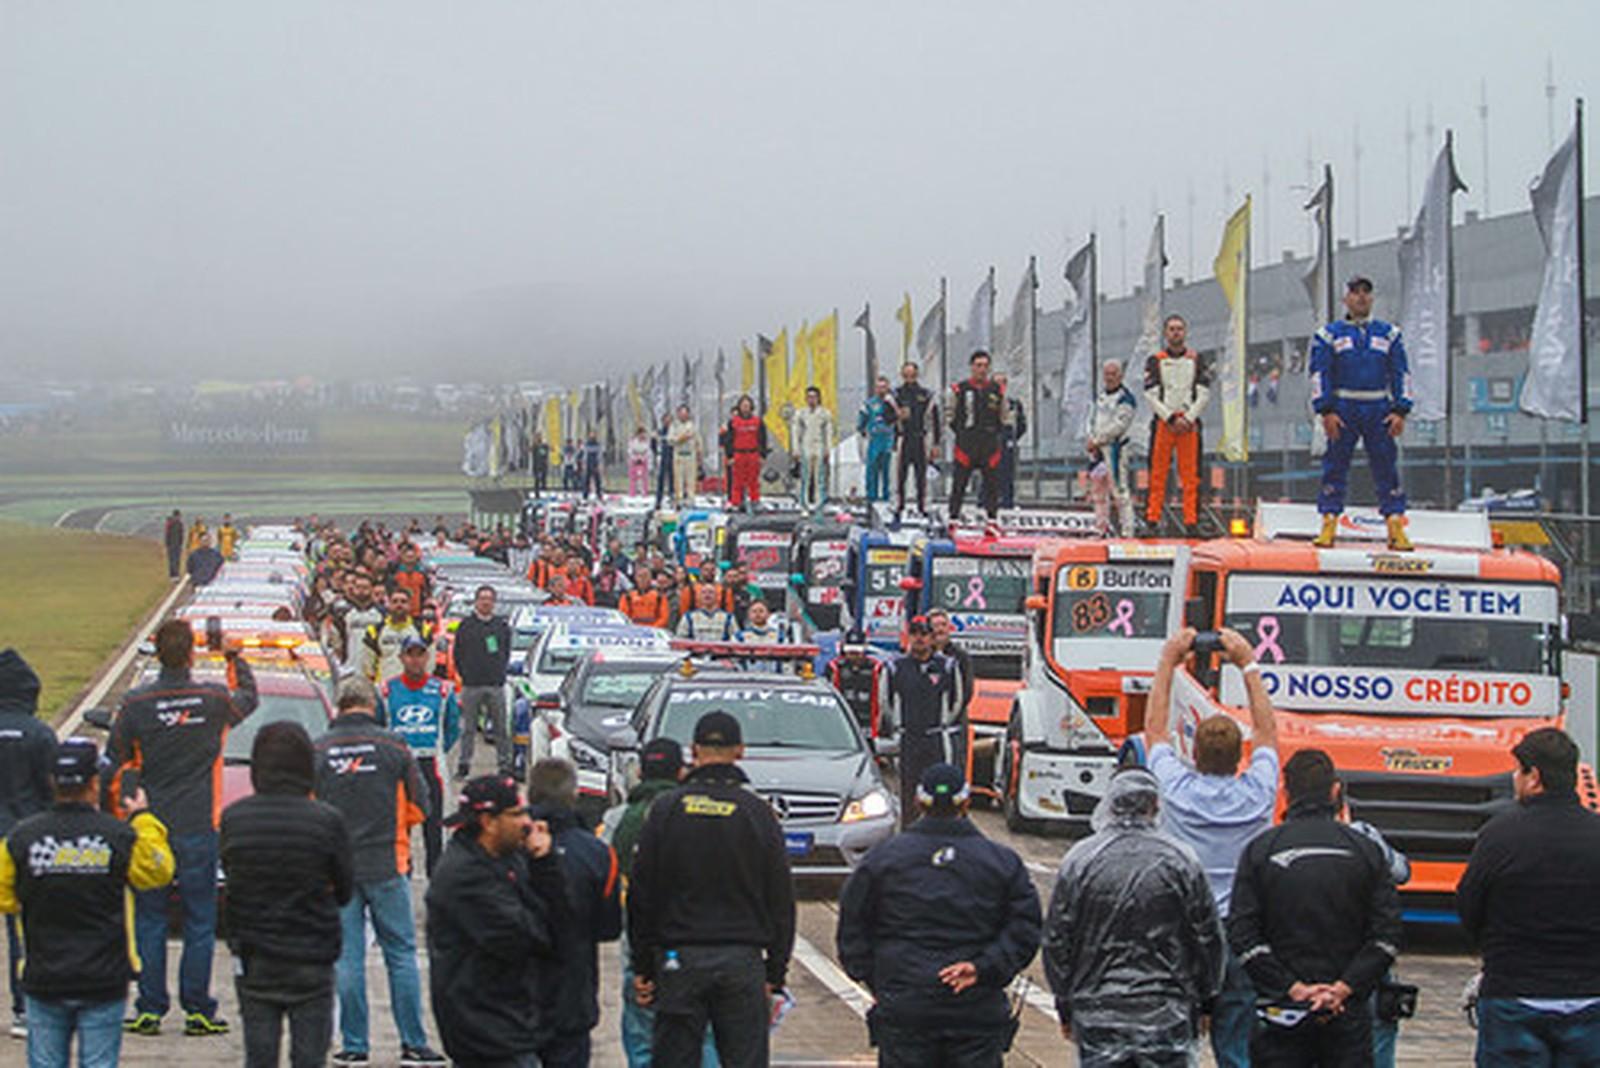 Família Flesch vai assistir final da Copa Truck, no autódromo internacional de Interlagos, em SP. — Foto: Vanderley Soares